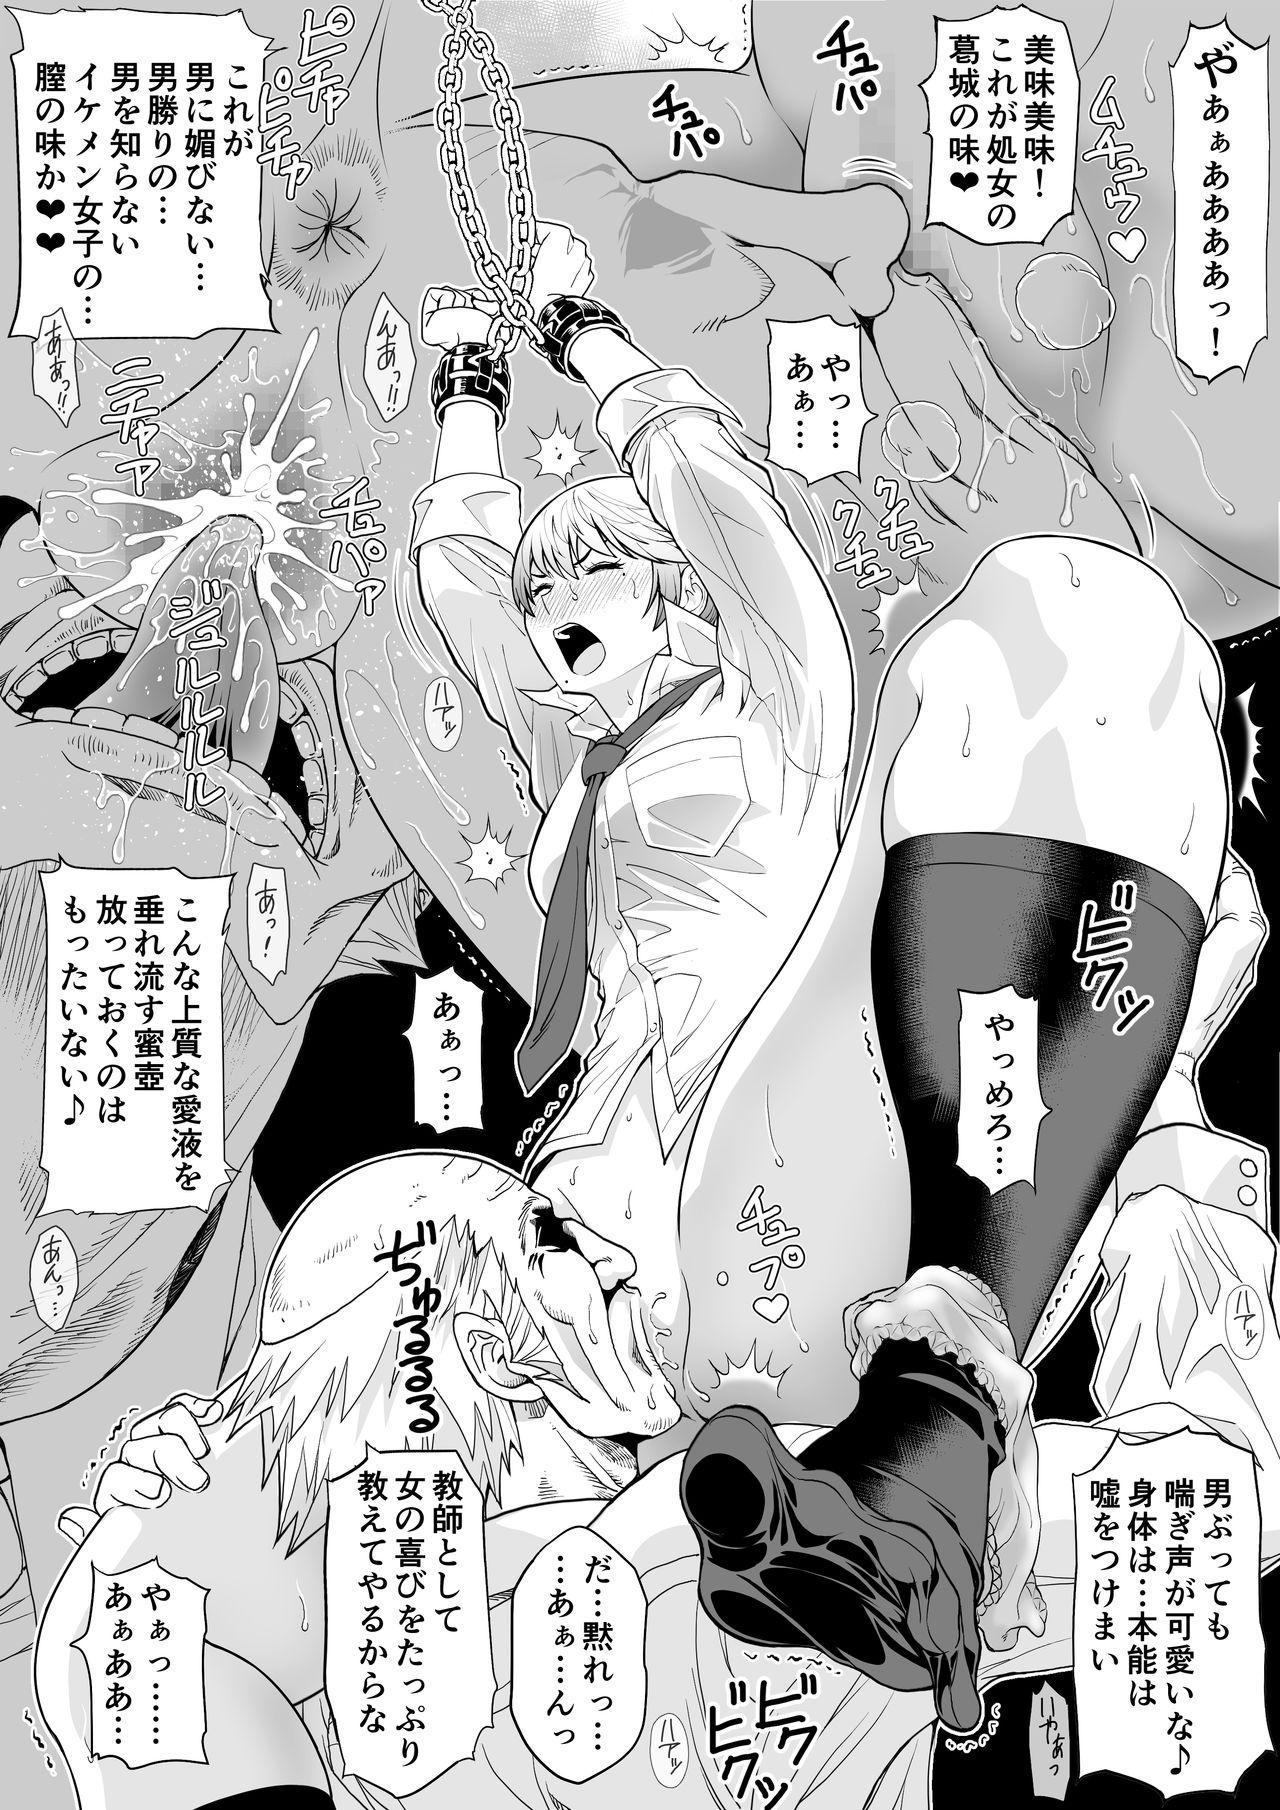 Namaiki mmusume ni tsuyo ● ikīki jugyō 14